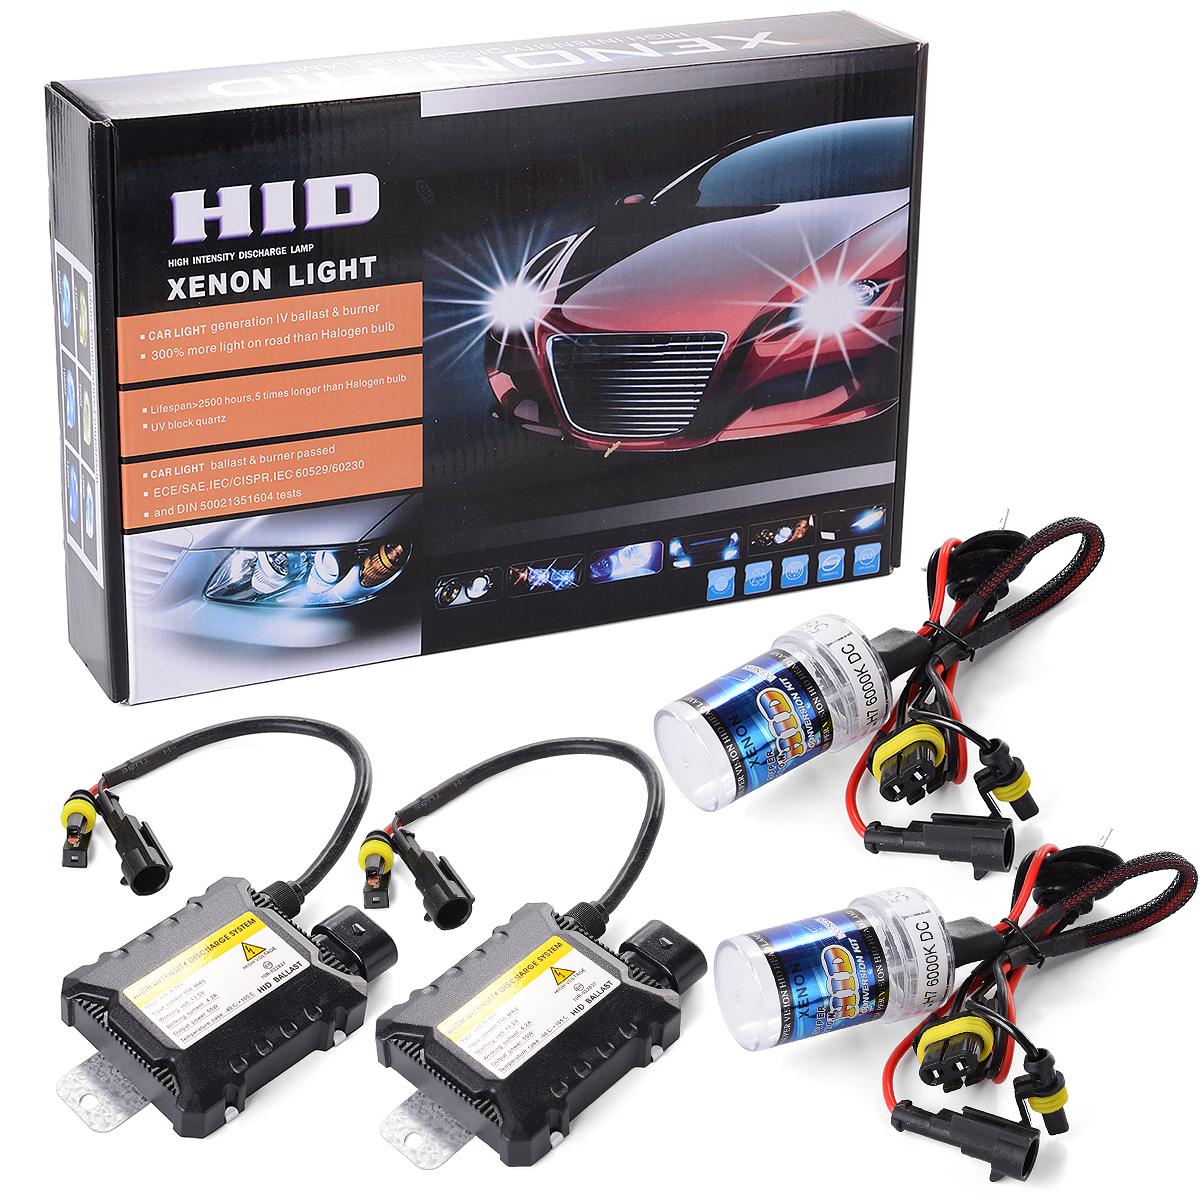 55W High Intensity Replacement Headlight Kit HID Xenon Lamp Bulbs 6000K H7 Foglight Slim Ballast Conversion Lighting MA098-SZ(China (Mainland))